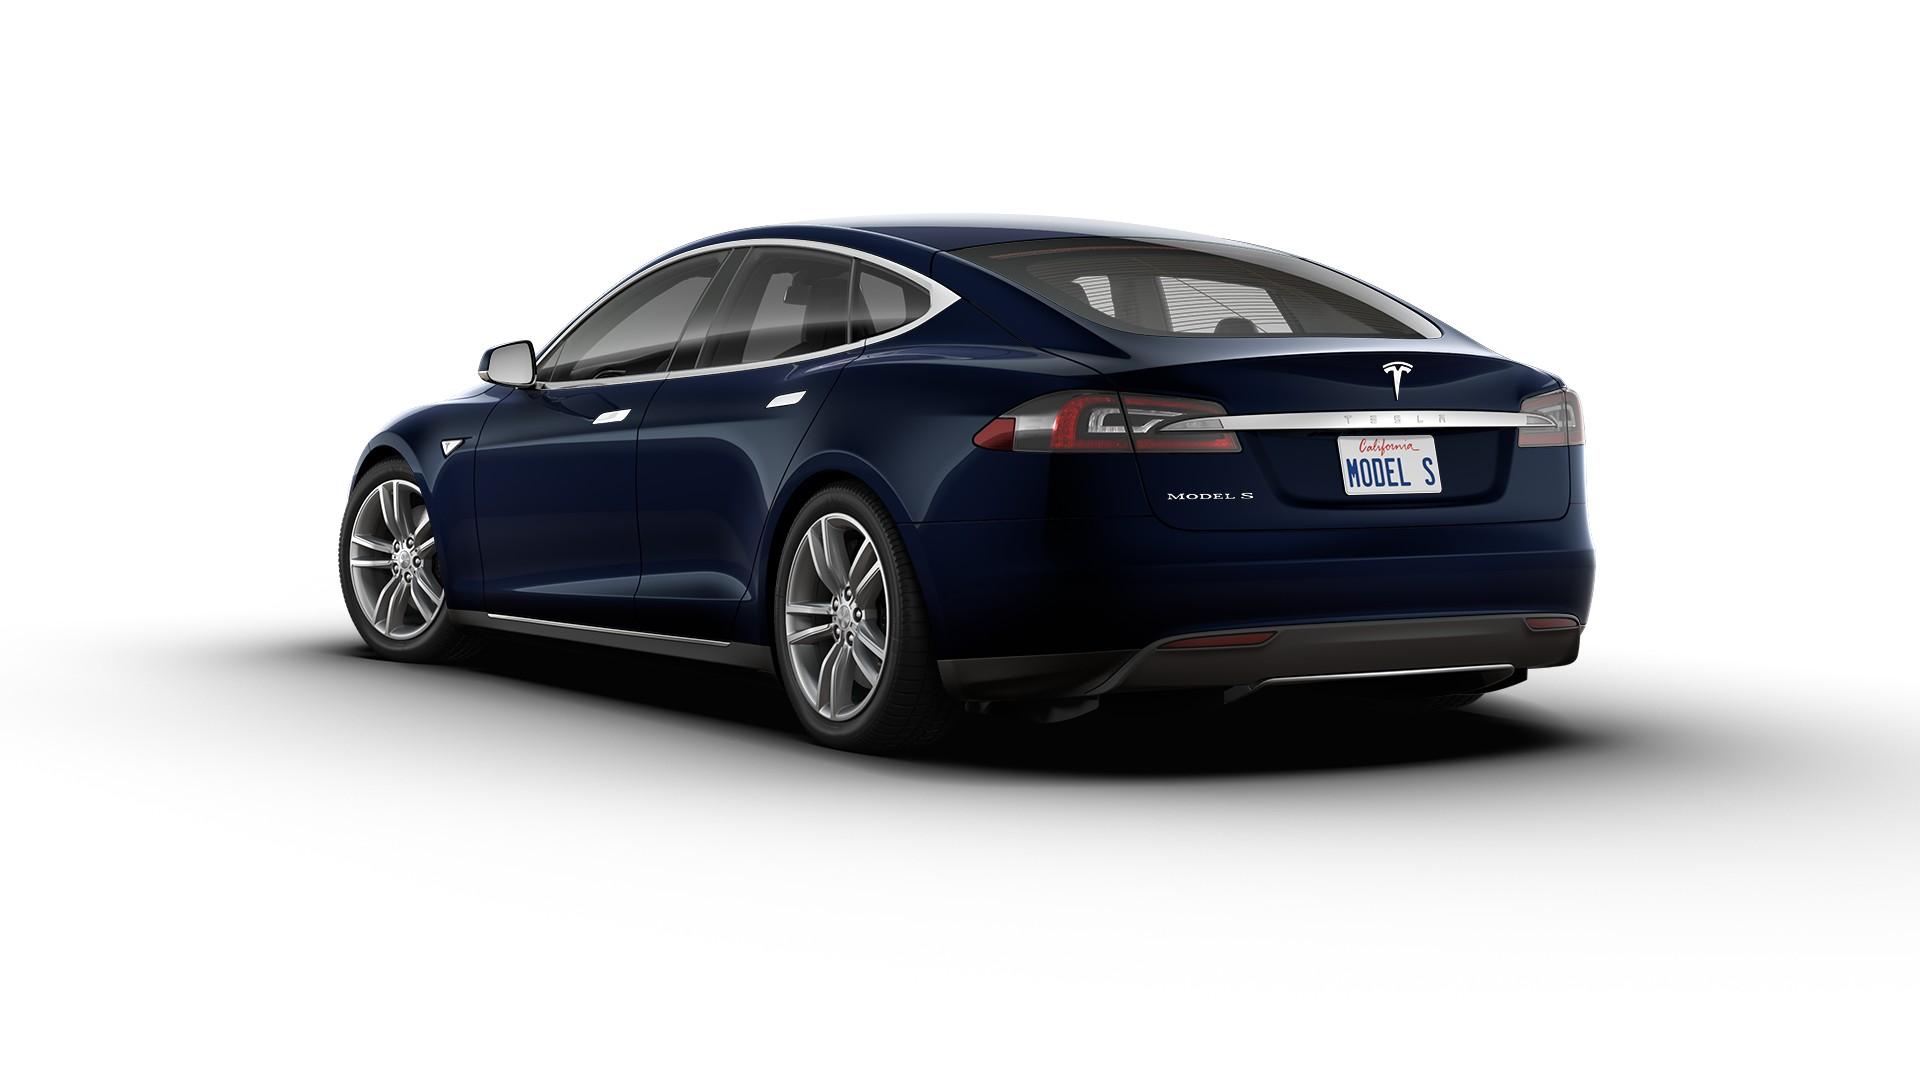 "Exterieur 19"" Wheels Blue Metallic (Monterey) Body Color Roof"